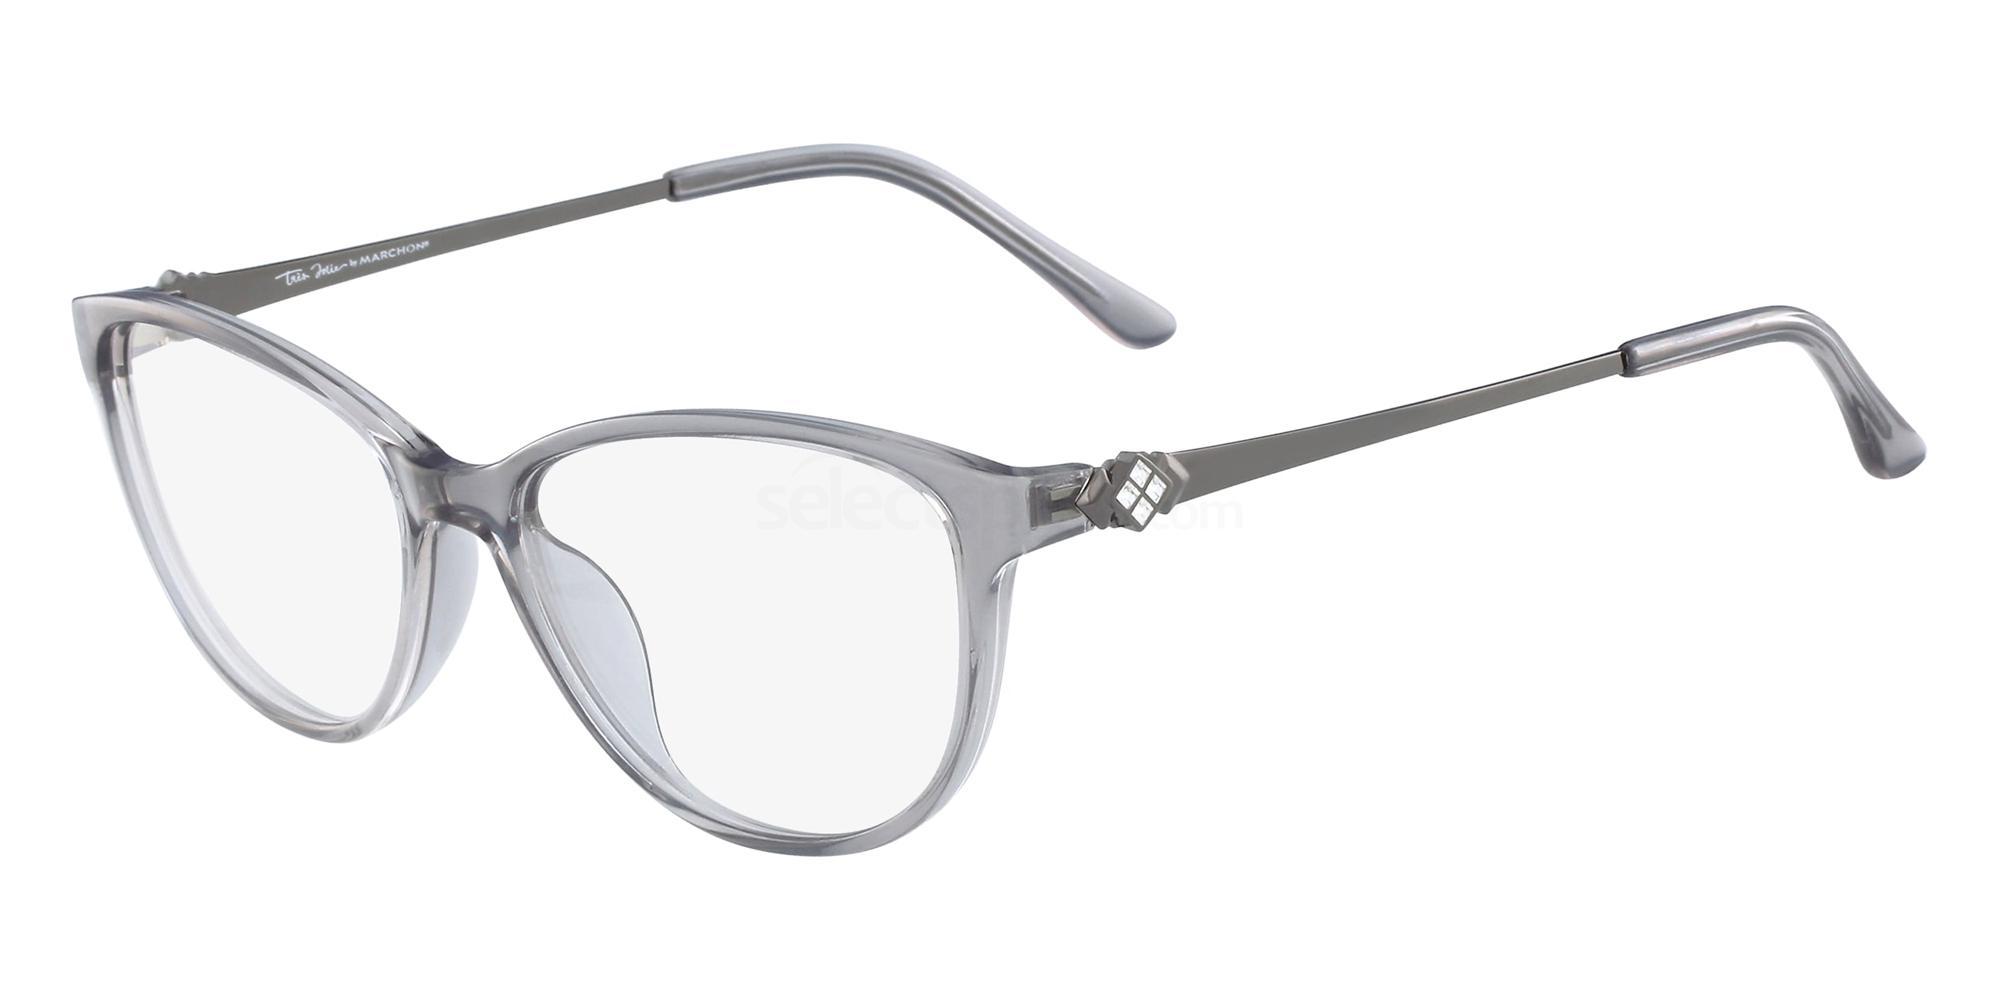 033 TRES JOLIE 172 Glasses, Tres Jolie